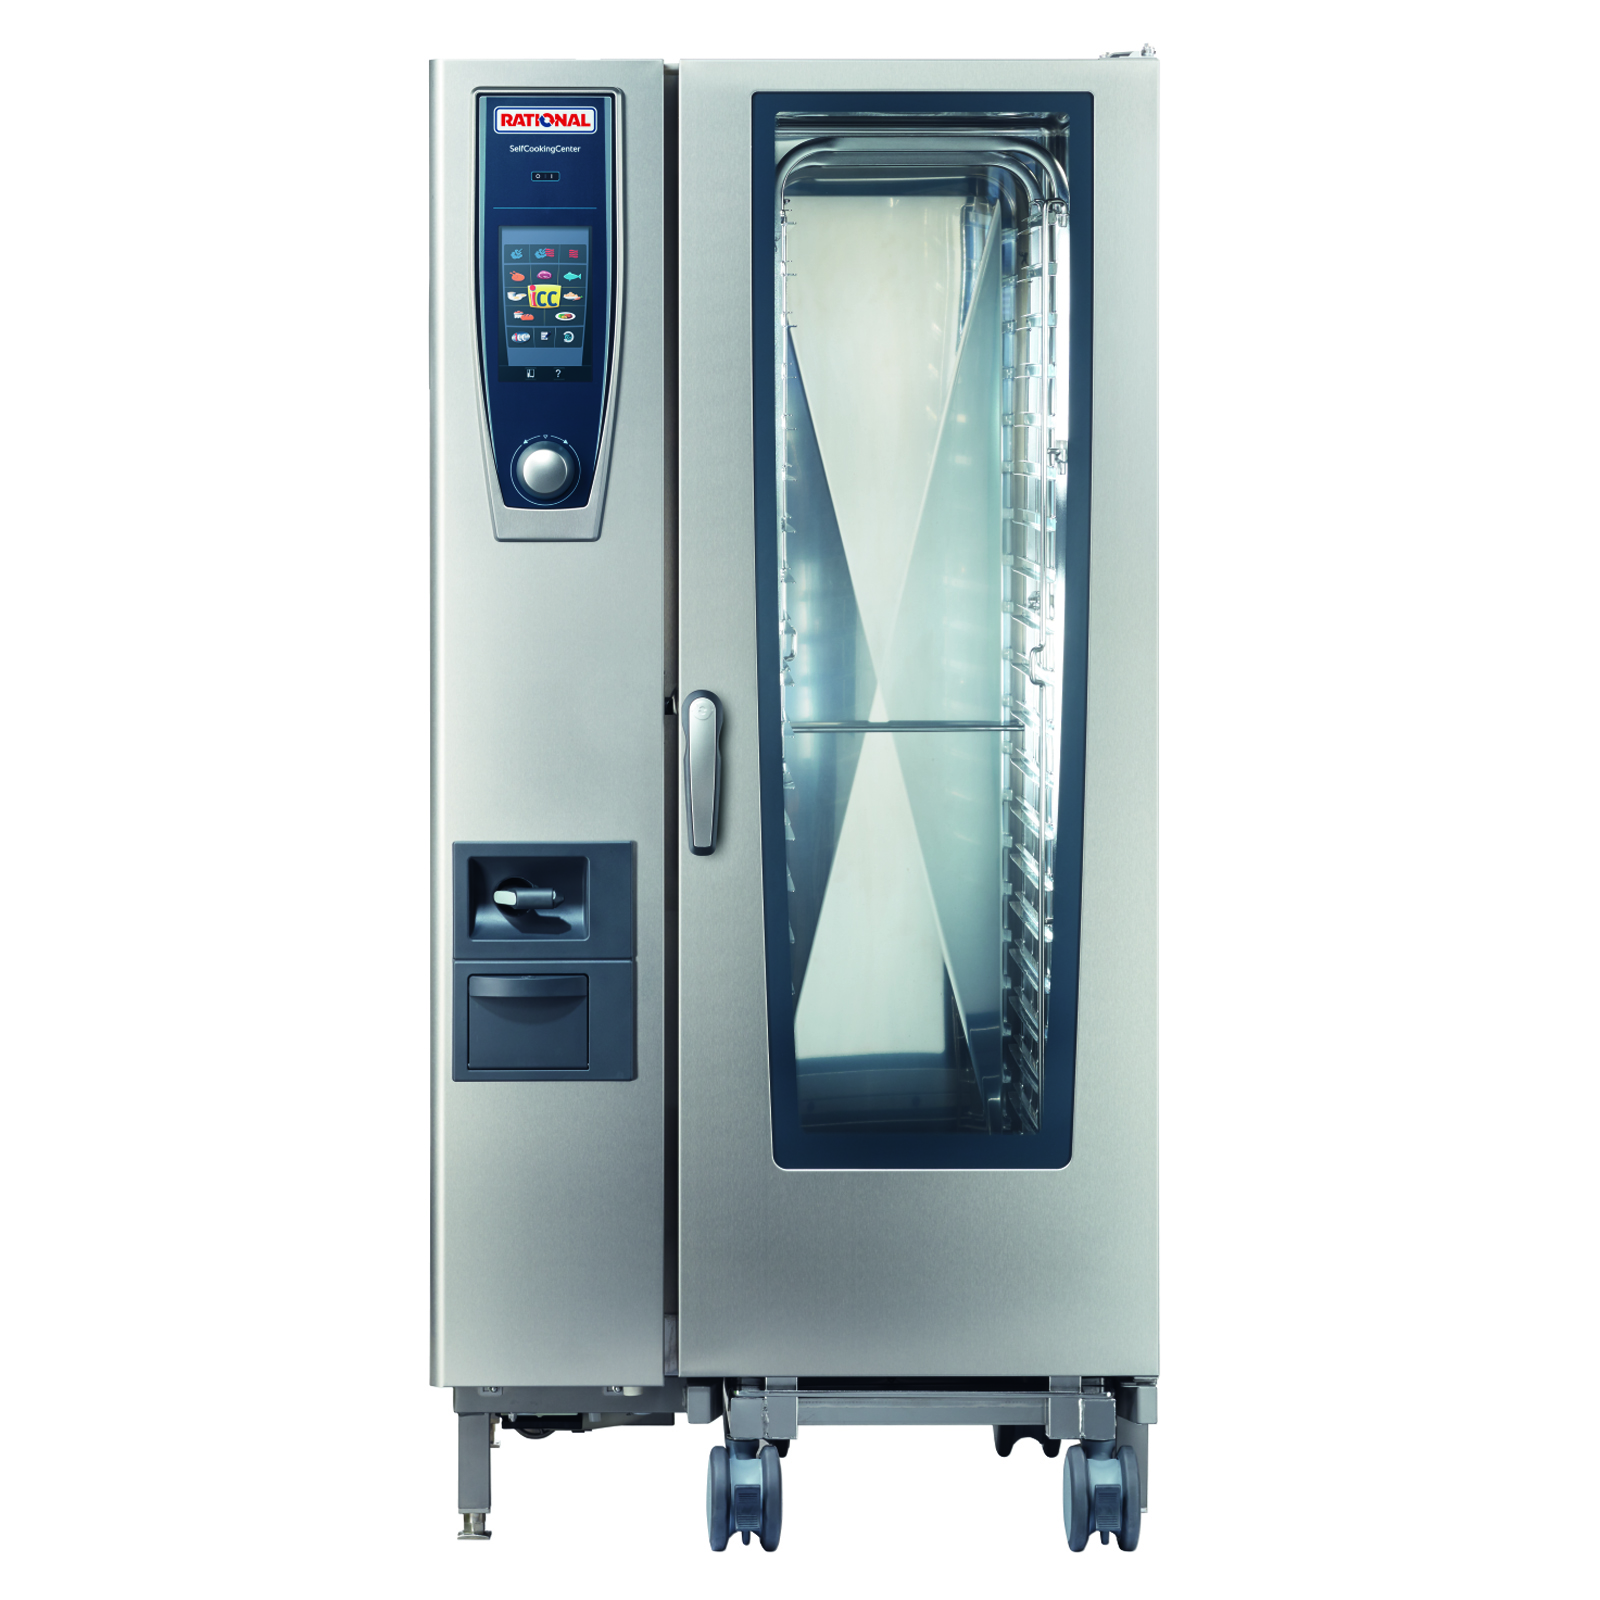 RATIONAL B218206.27E combi oven, gas